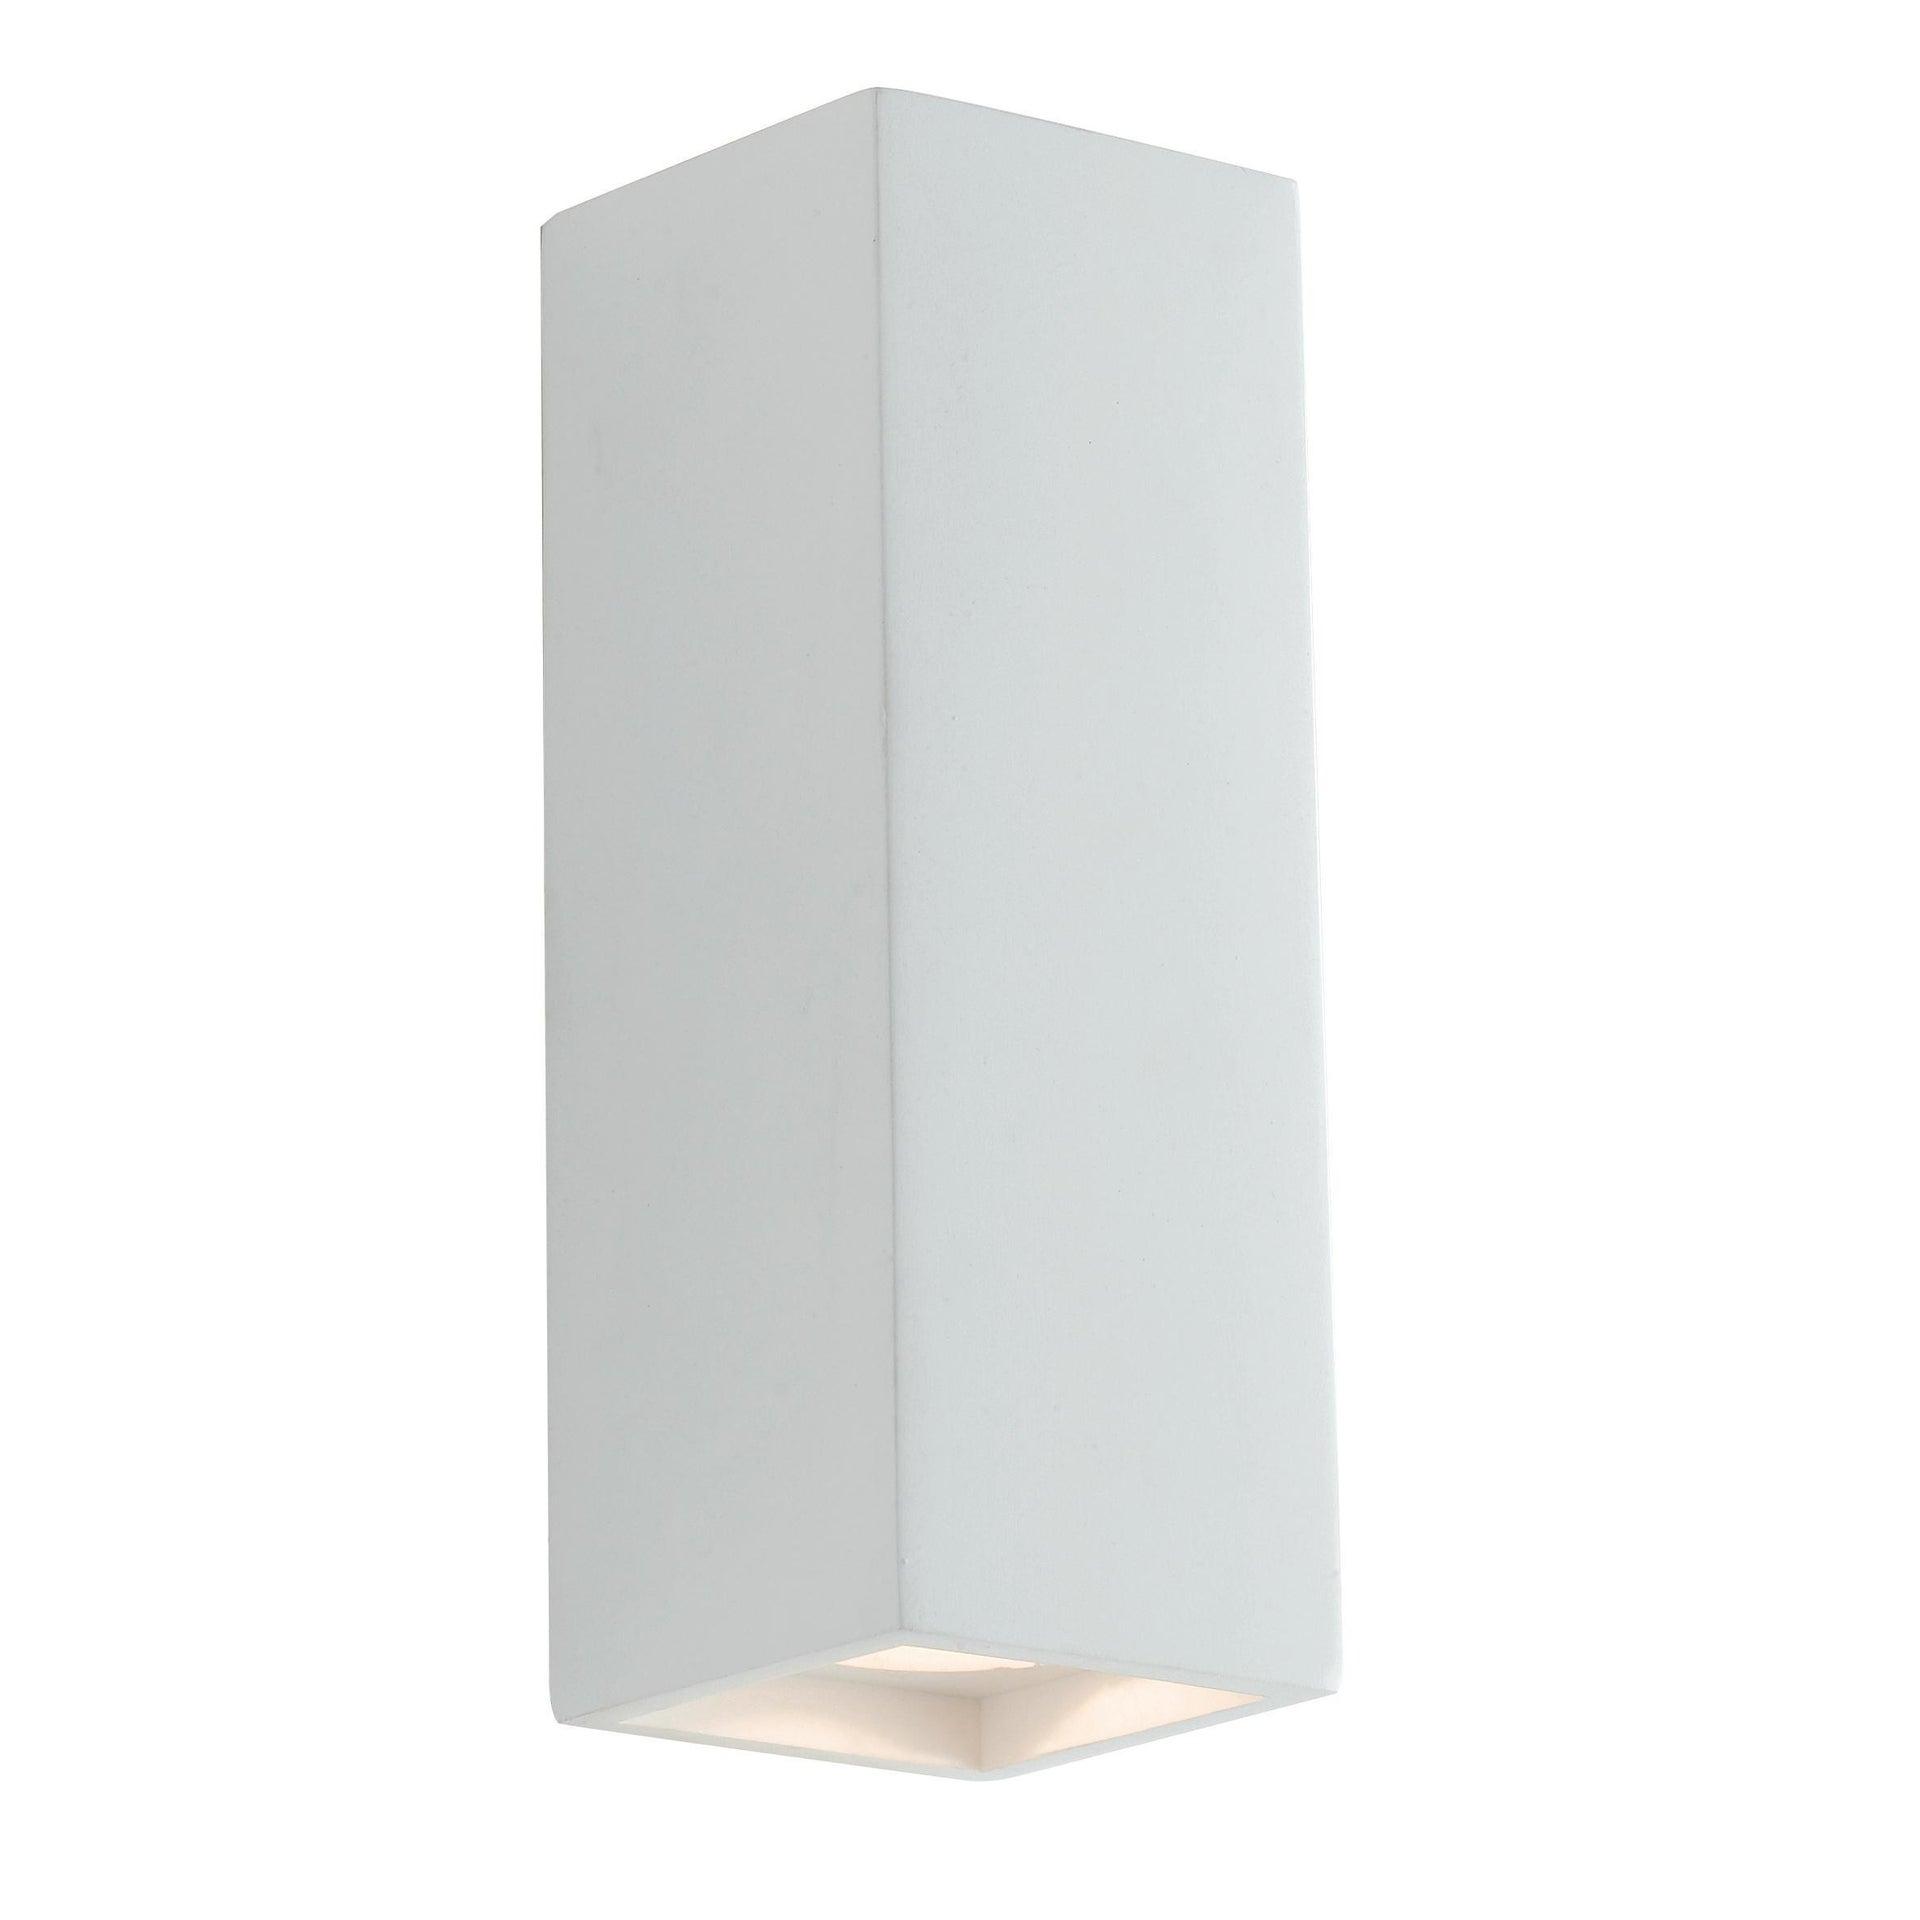 Applique design gesso Foster bianco, in calcestruzzo, 7.3 cm, 2 luci INTEC - 2